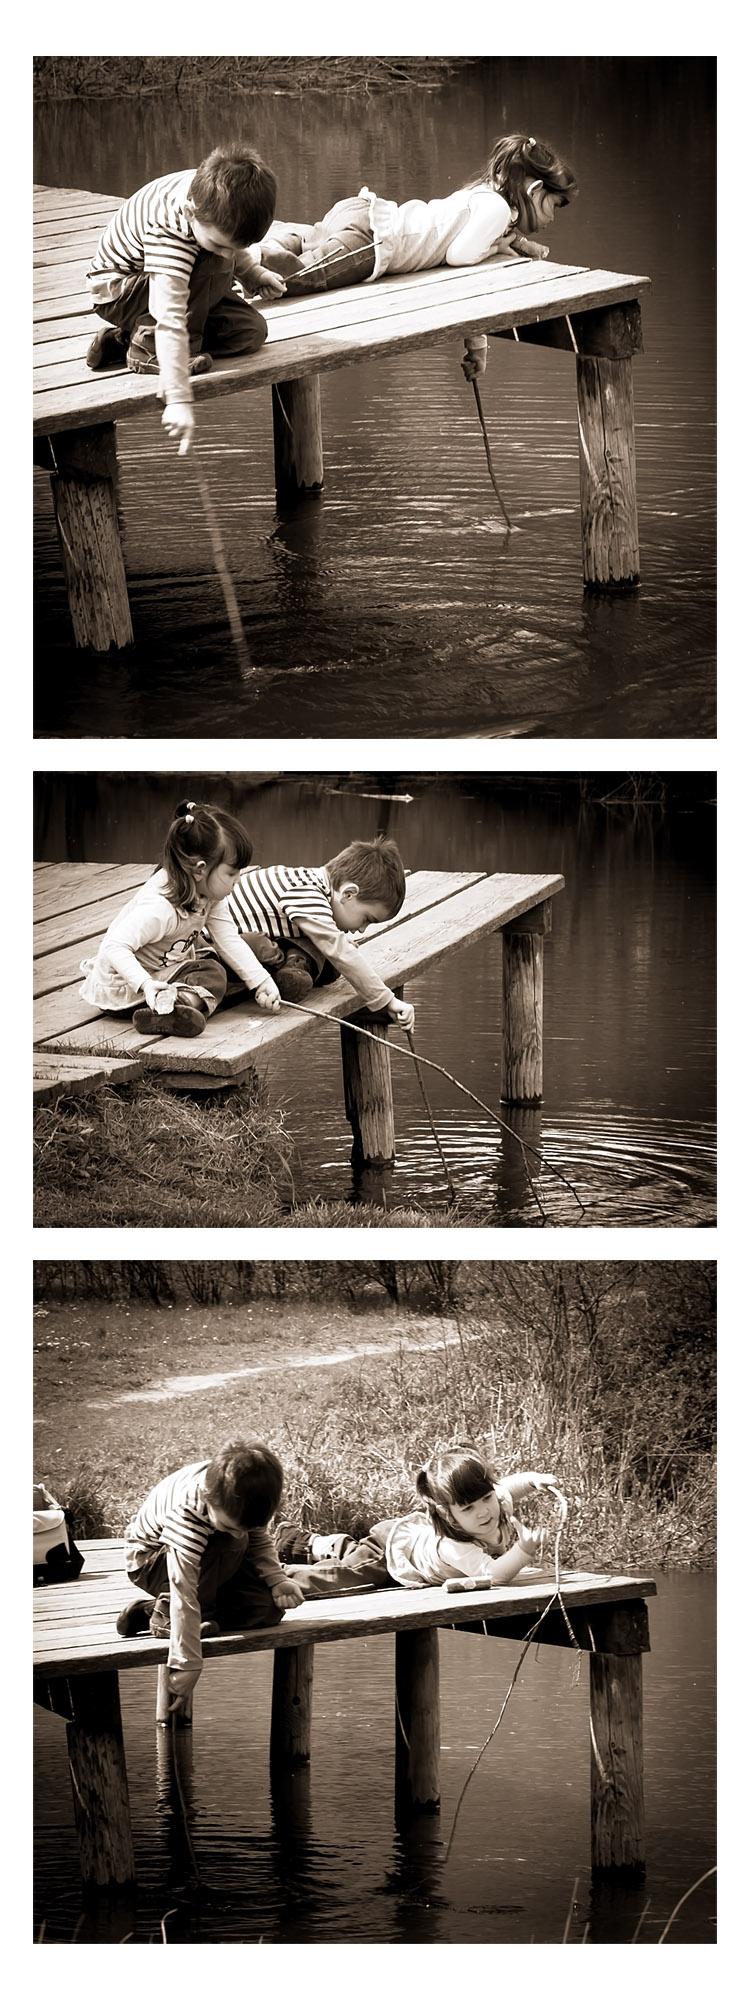 http://fredetsev.eu/imagespourblog/enfants_pechent.jpg